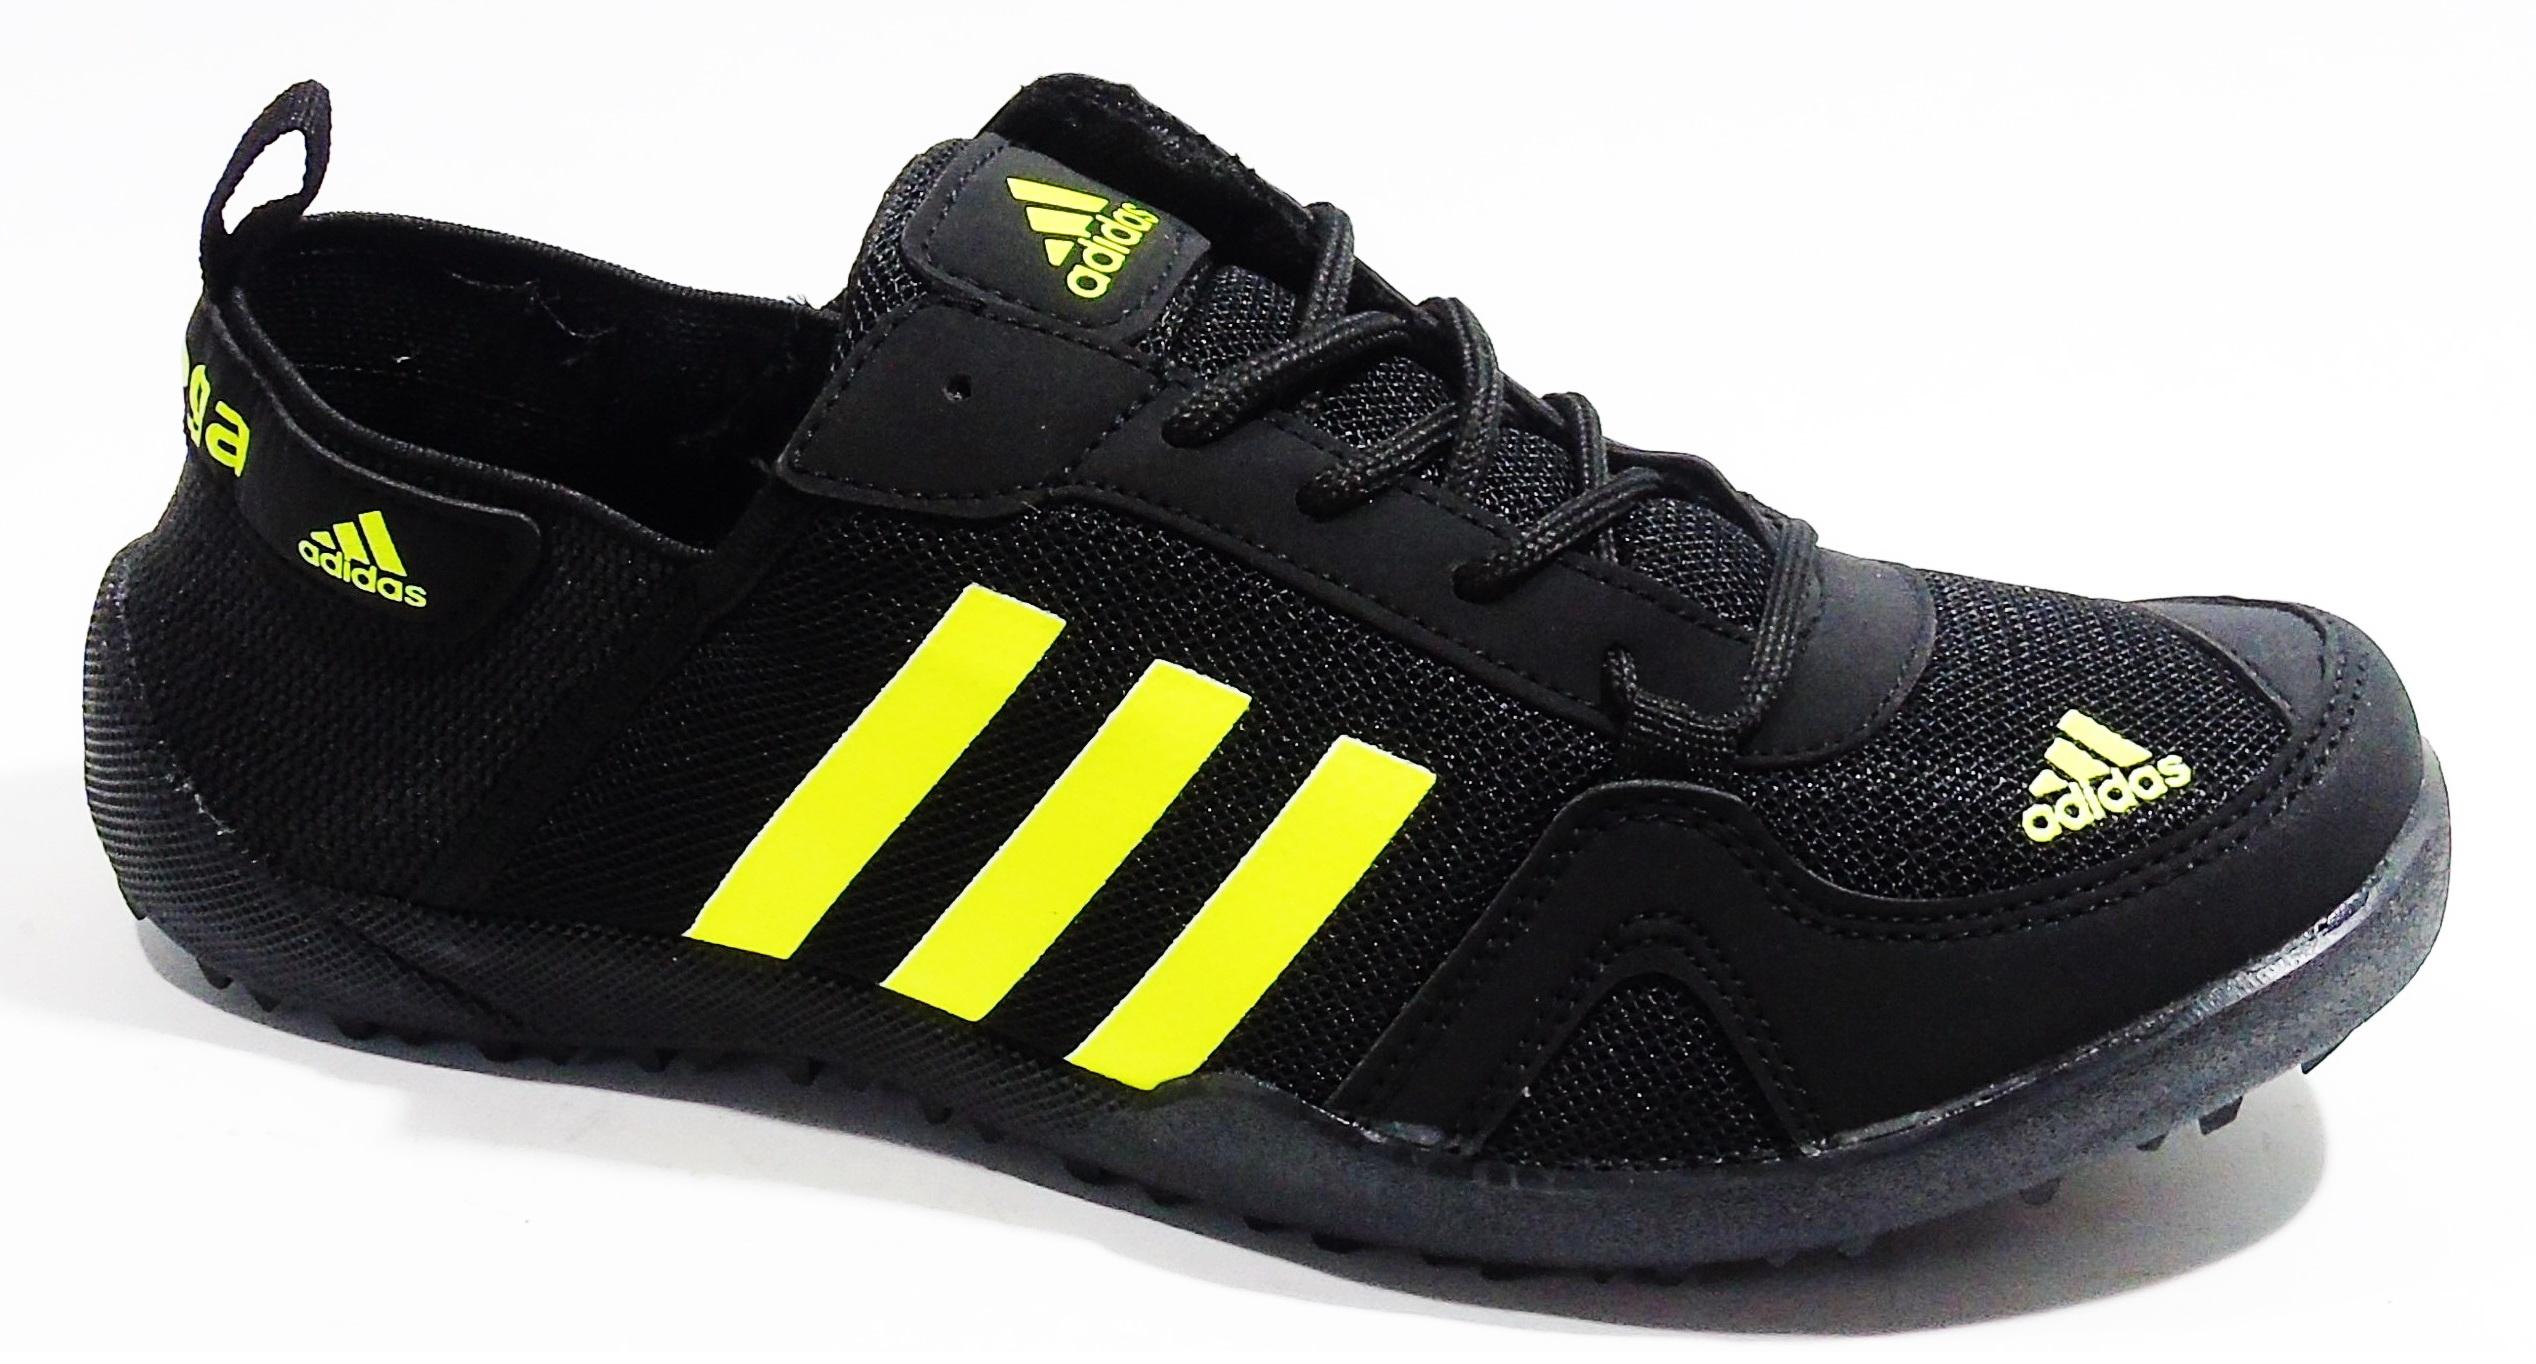 Маратонки Adidas Daroga Climacool черно-неон